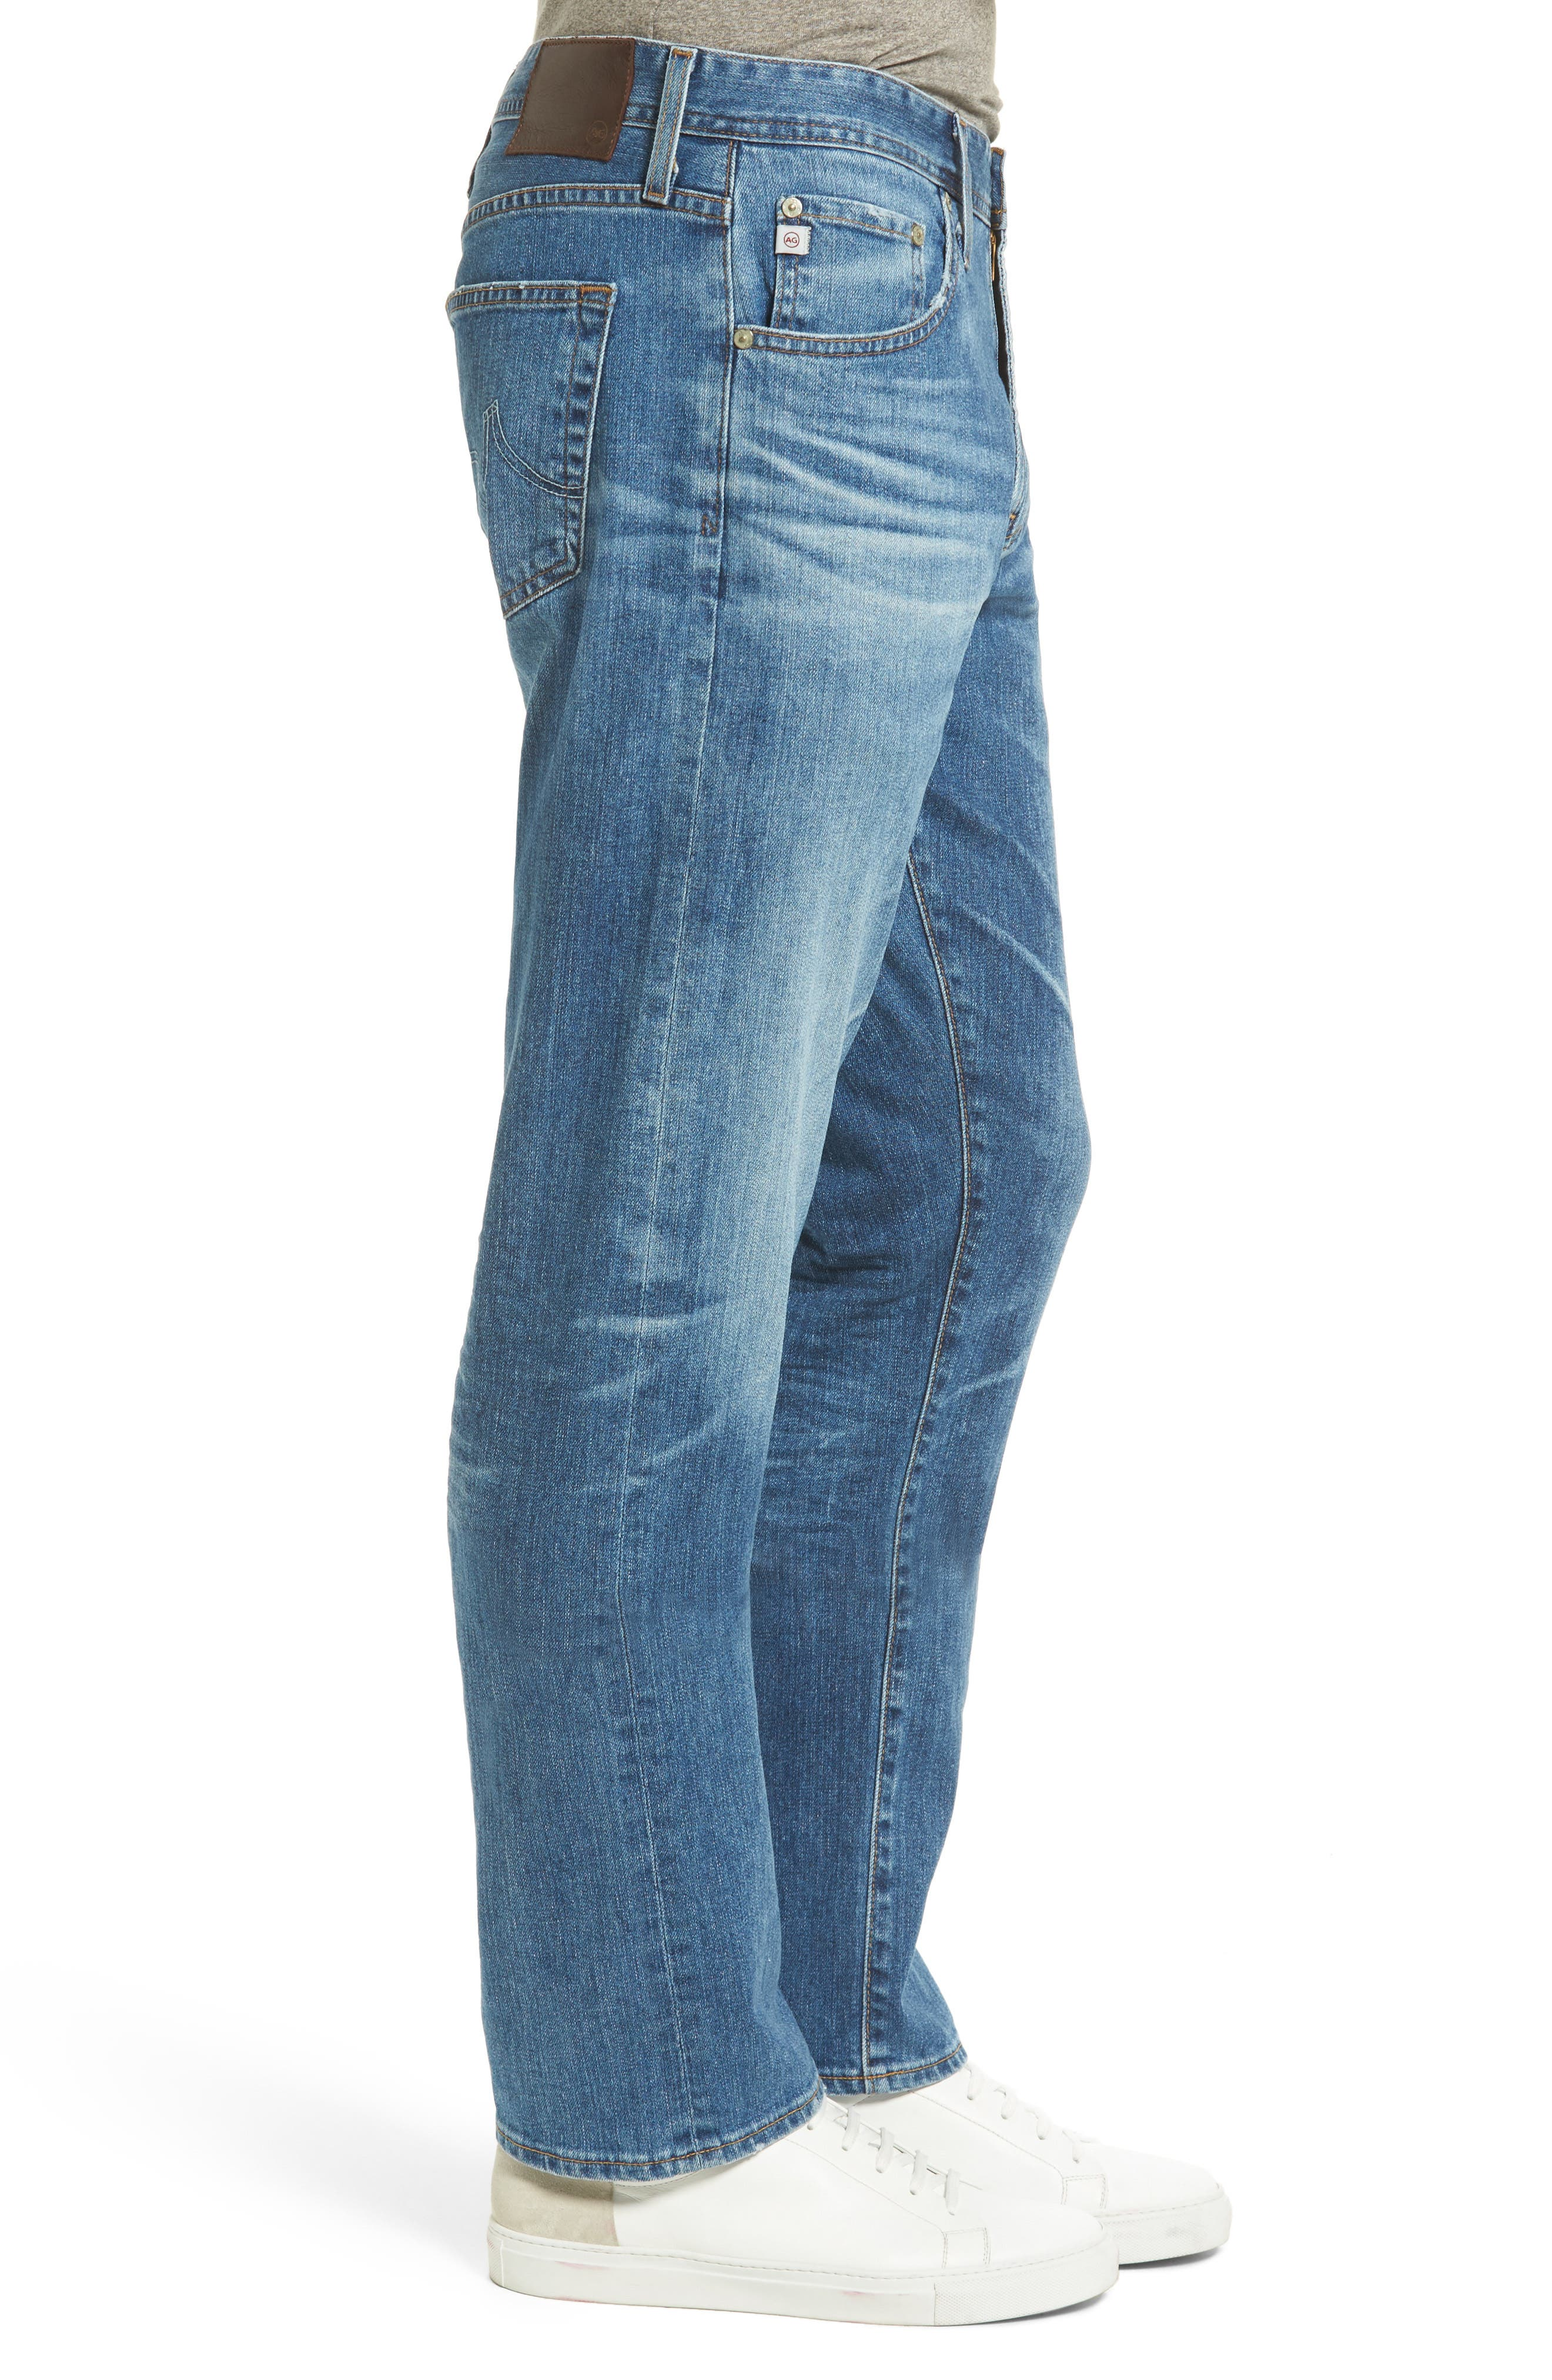 Ives Straight Leg Jeans,                             Alternate thumbnail 3, color,                             16 Years Broken Ground